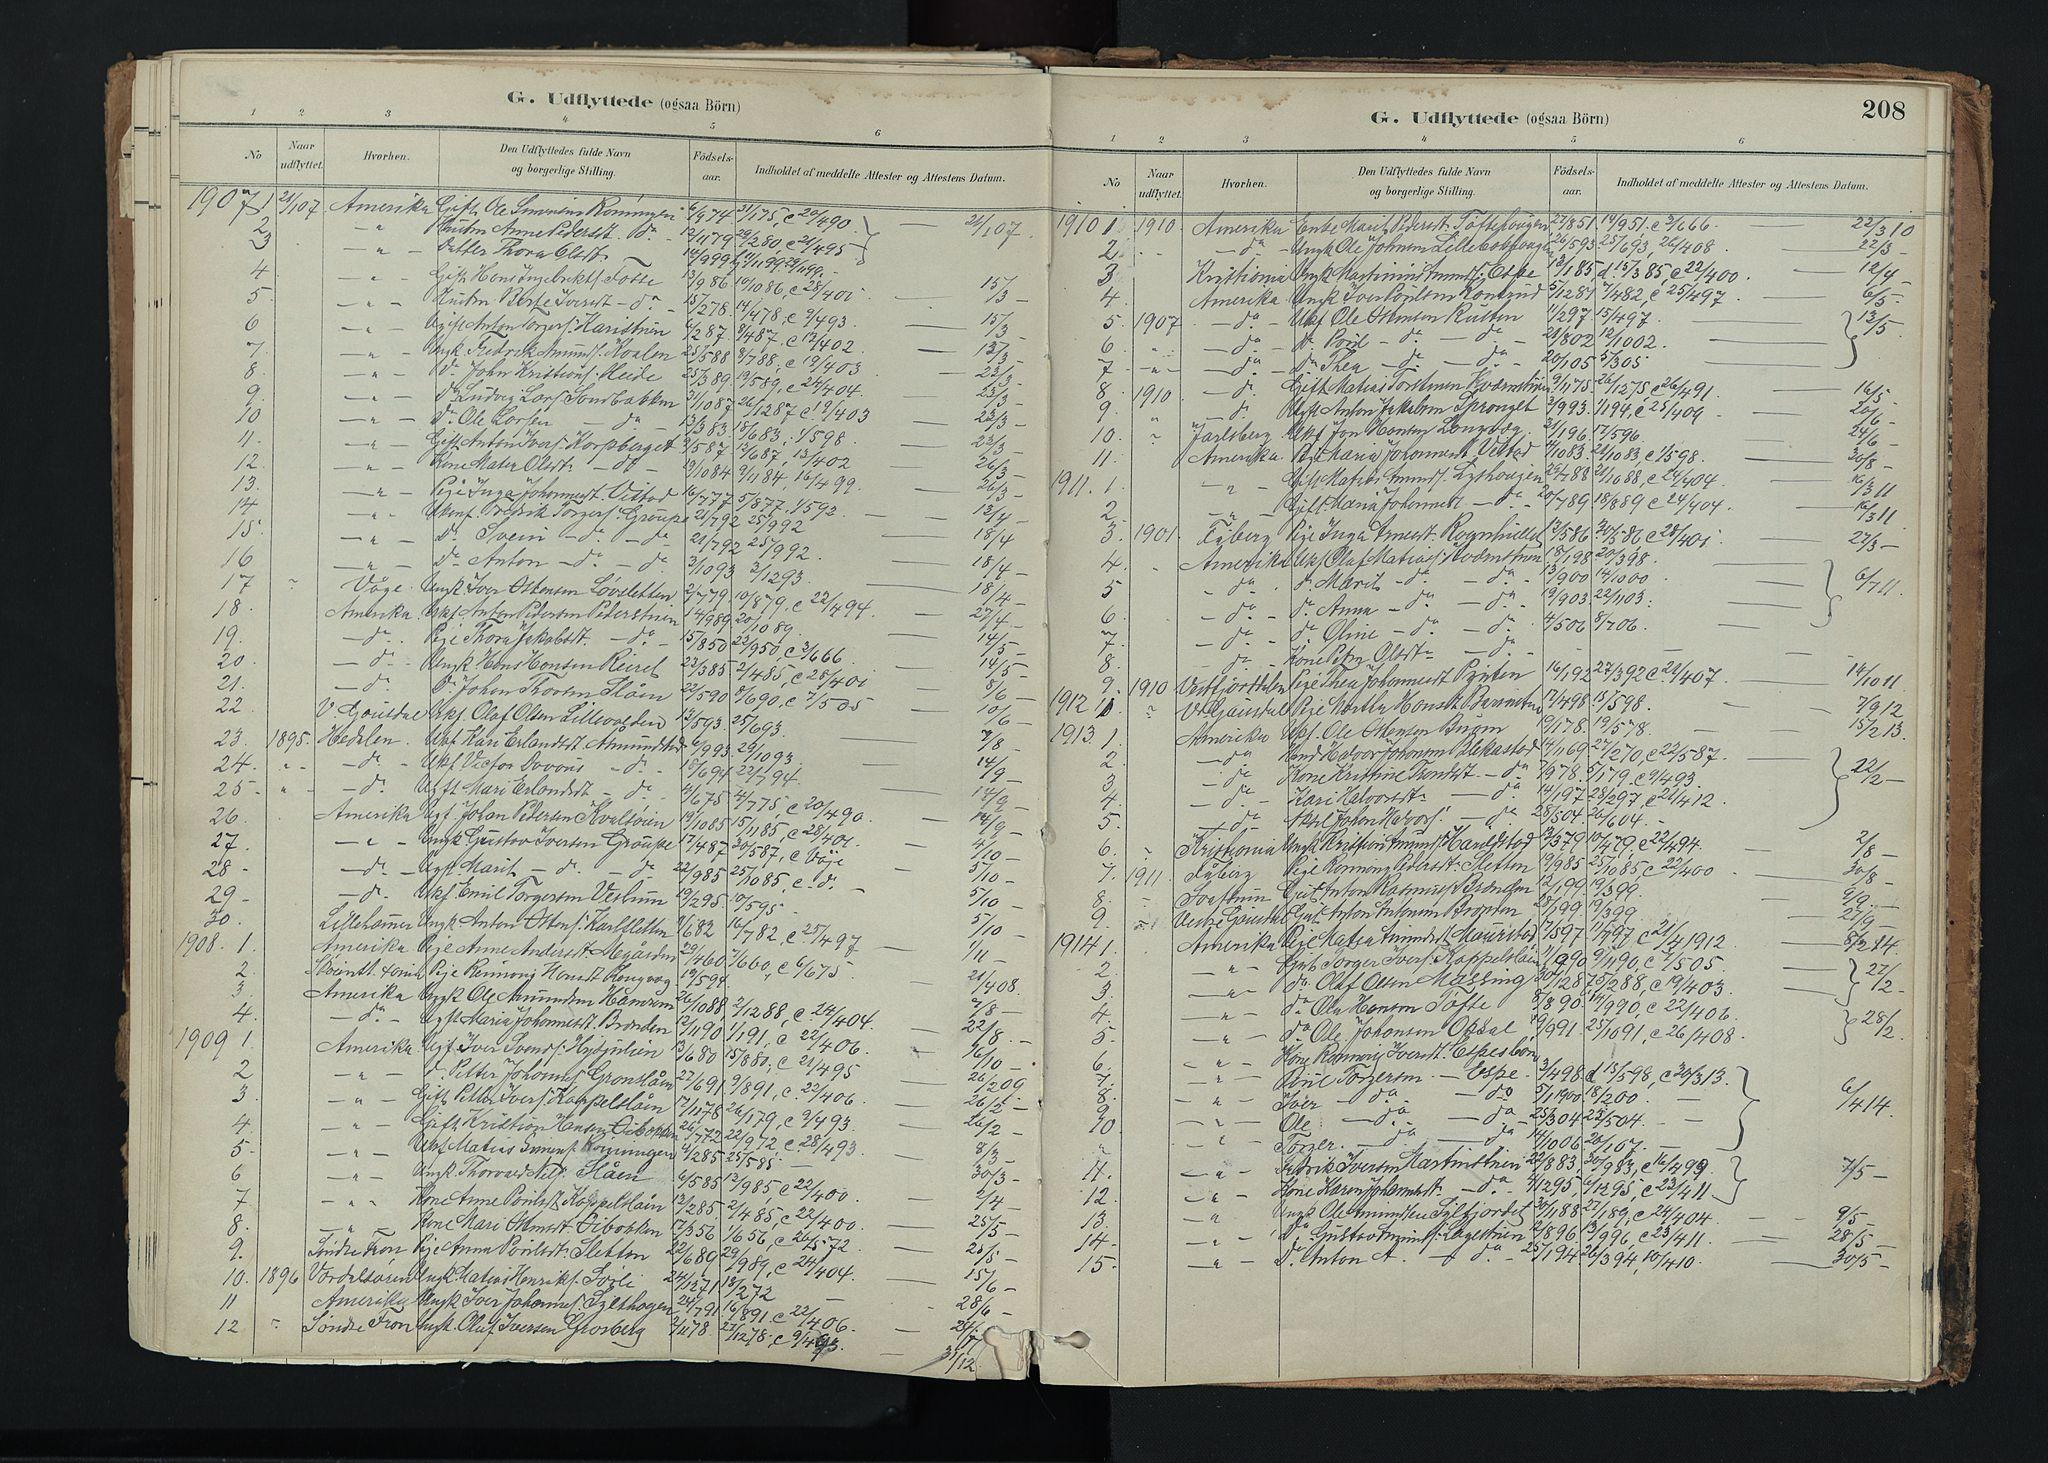 SAH, Nord-Fron prestekontor, Ministerialbok nr. 5, 1884-1914, s. 208